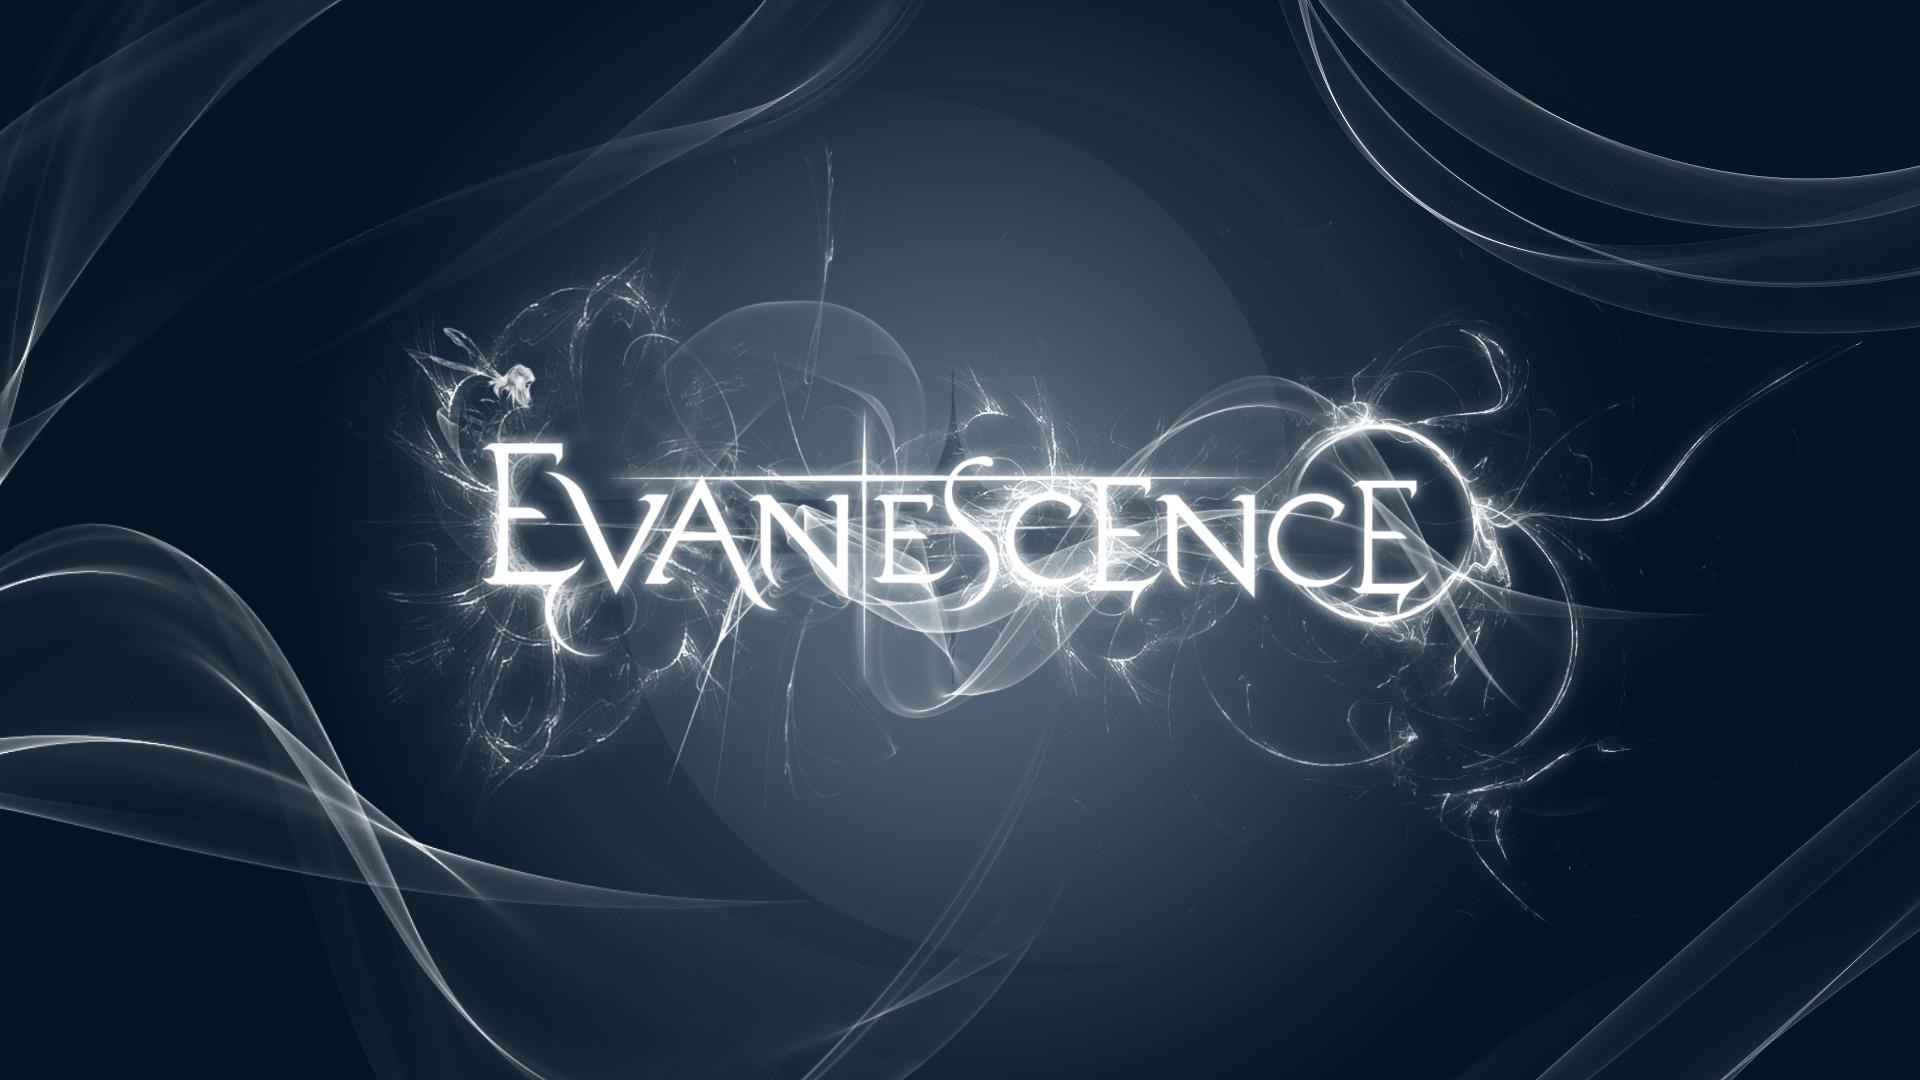 Evanescence Logo Wallpaper Evanescence wallpapers propios 1920x1080